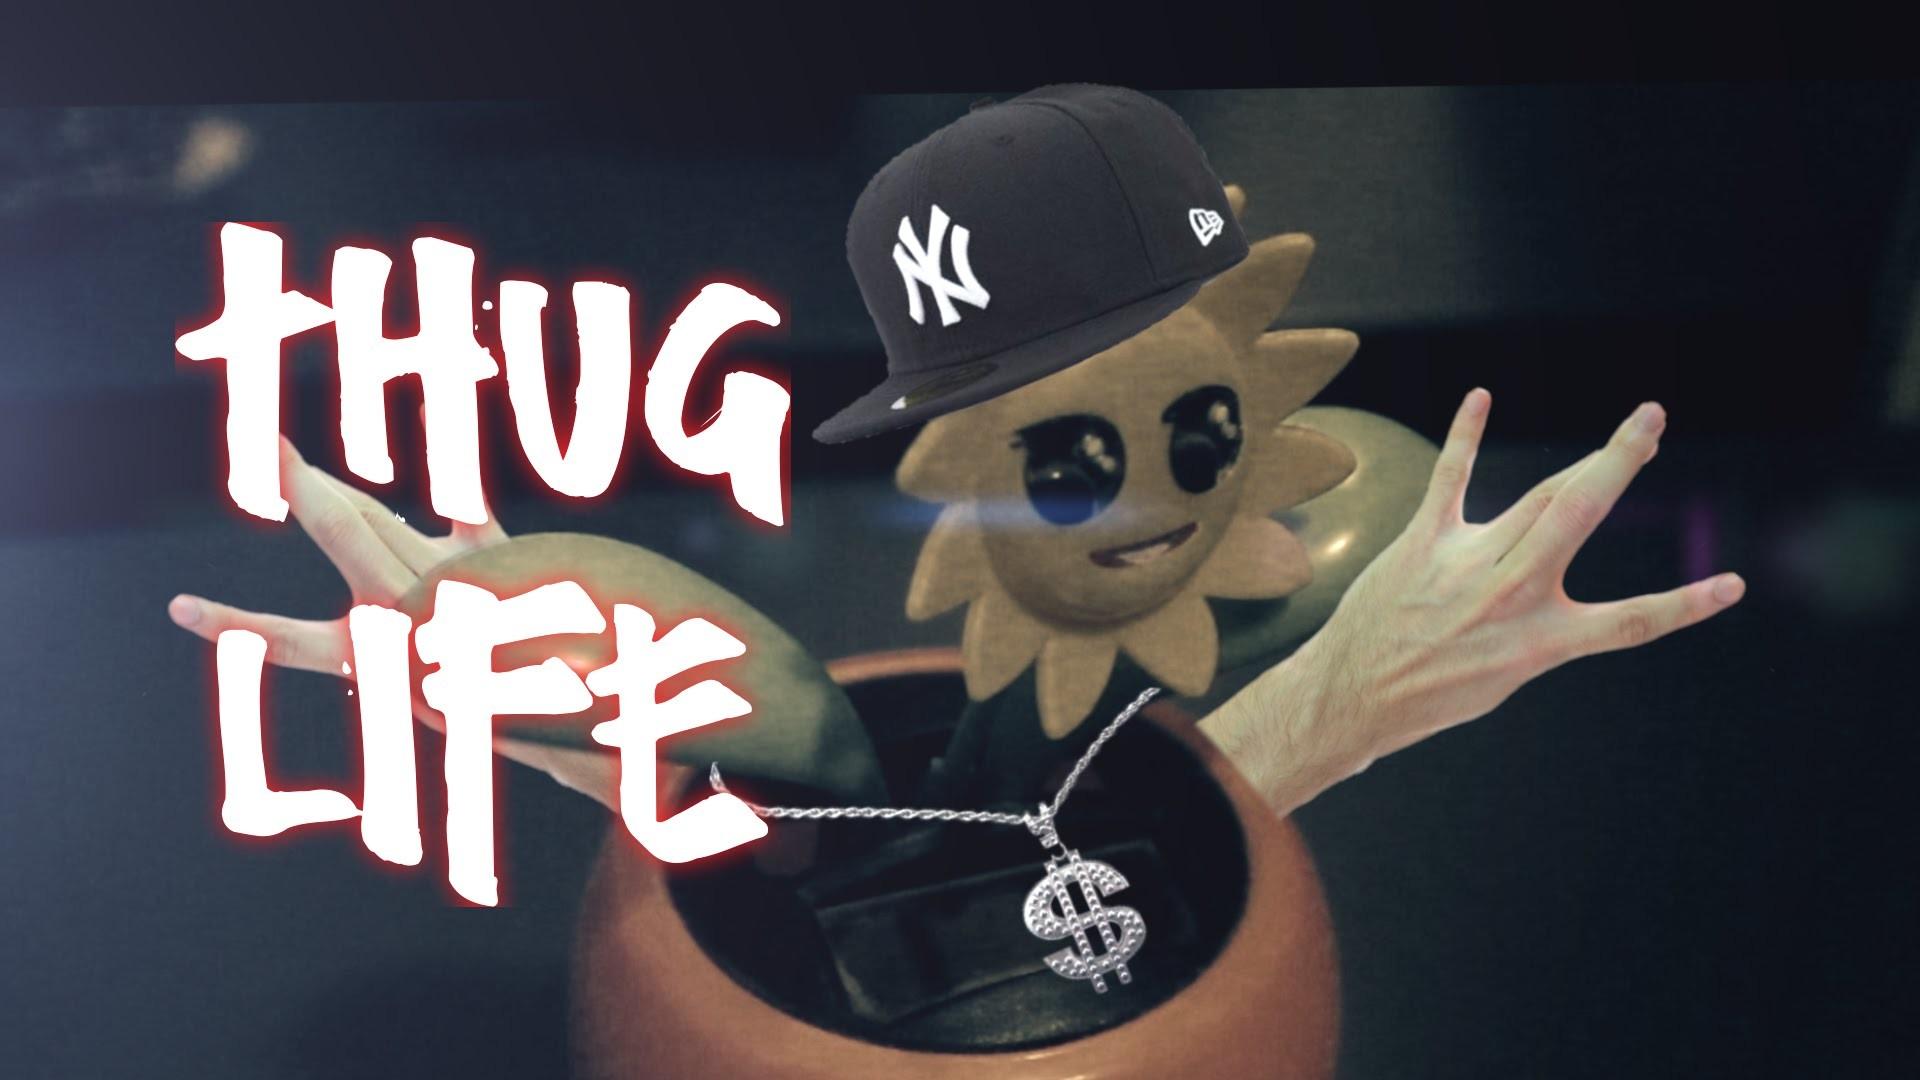 Thug Life Wallpaper (72+ Images